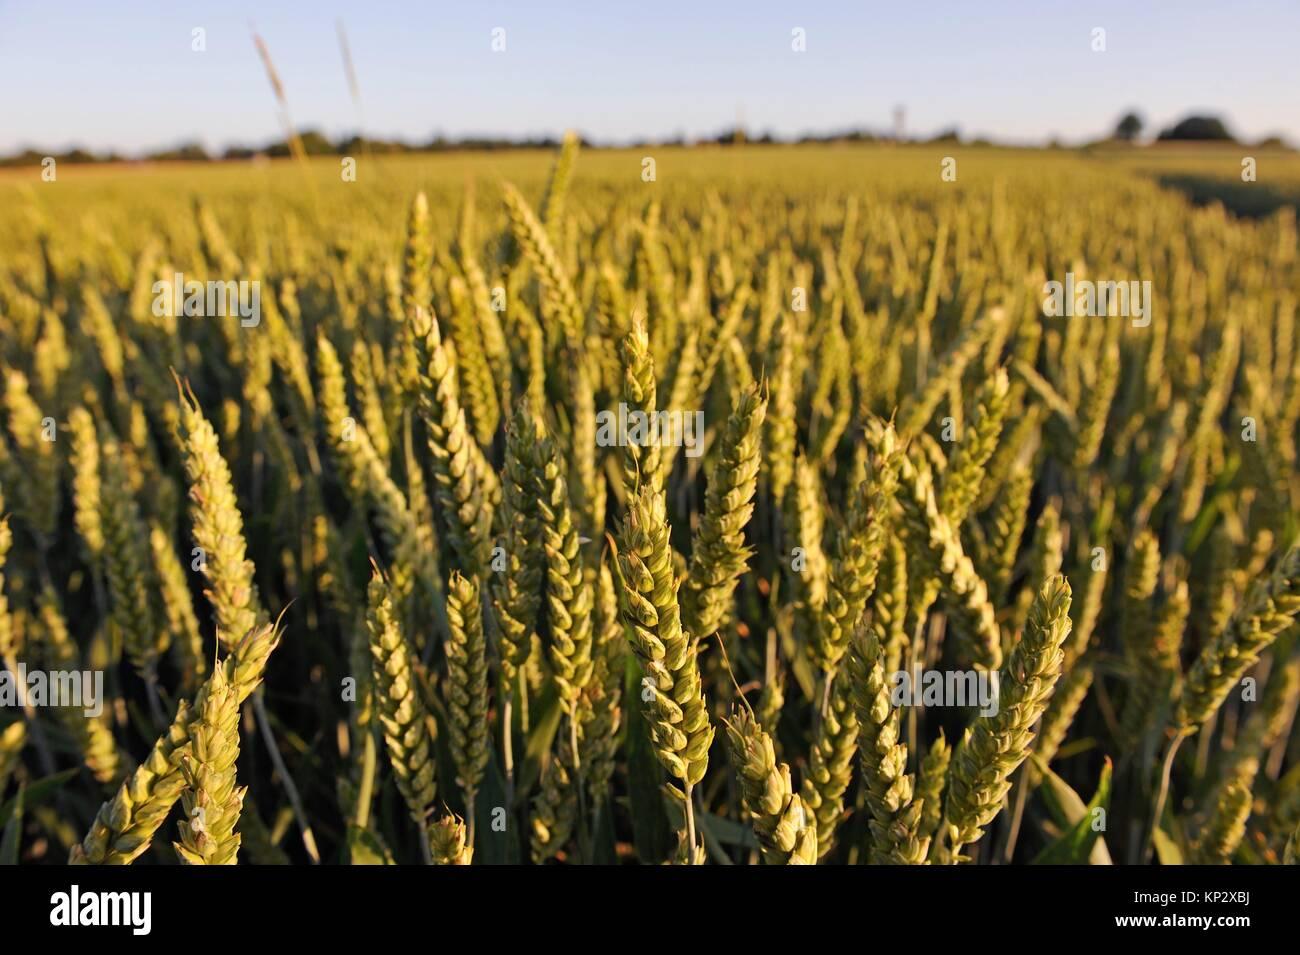 wheat field, Centre-Val de Loire region, France, Europe. - Stock Image